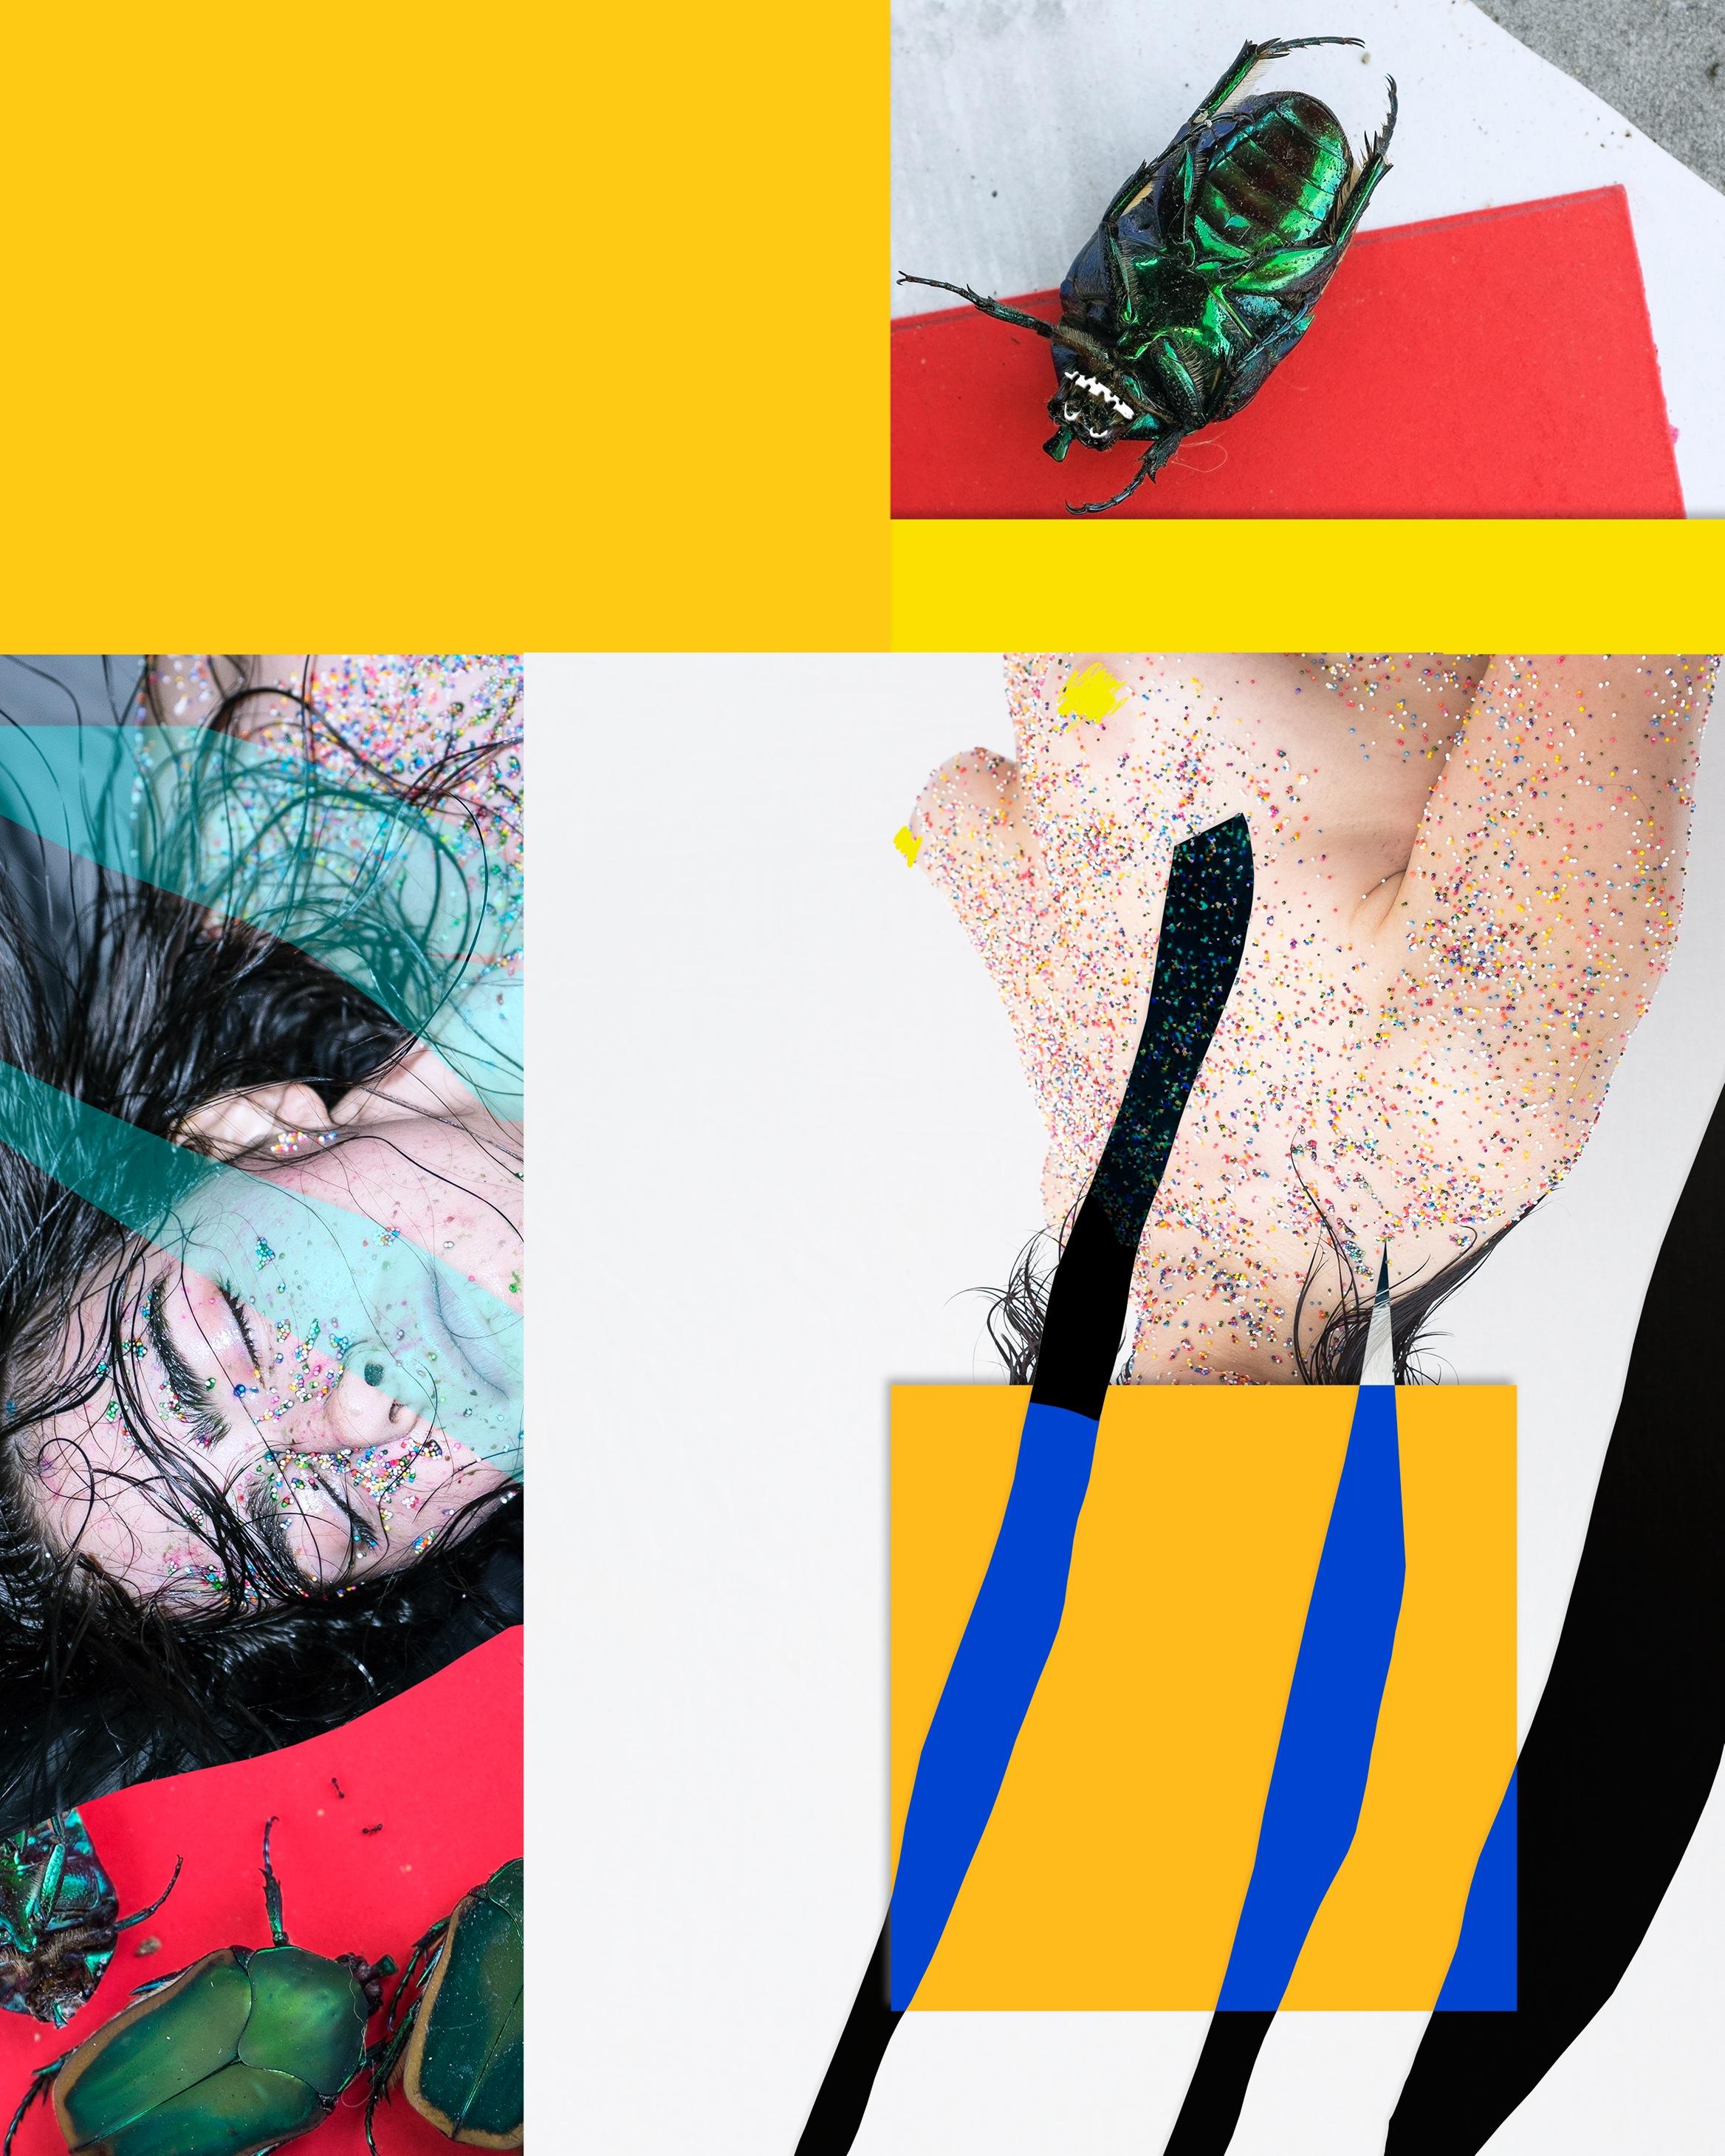 Icarus (Descent)  Archival pigment print  Ed. 1/1 + 2 AP  193 x 155 cm  2015